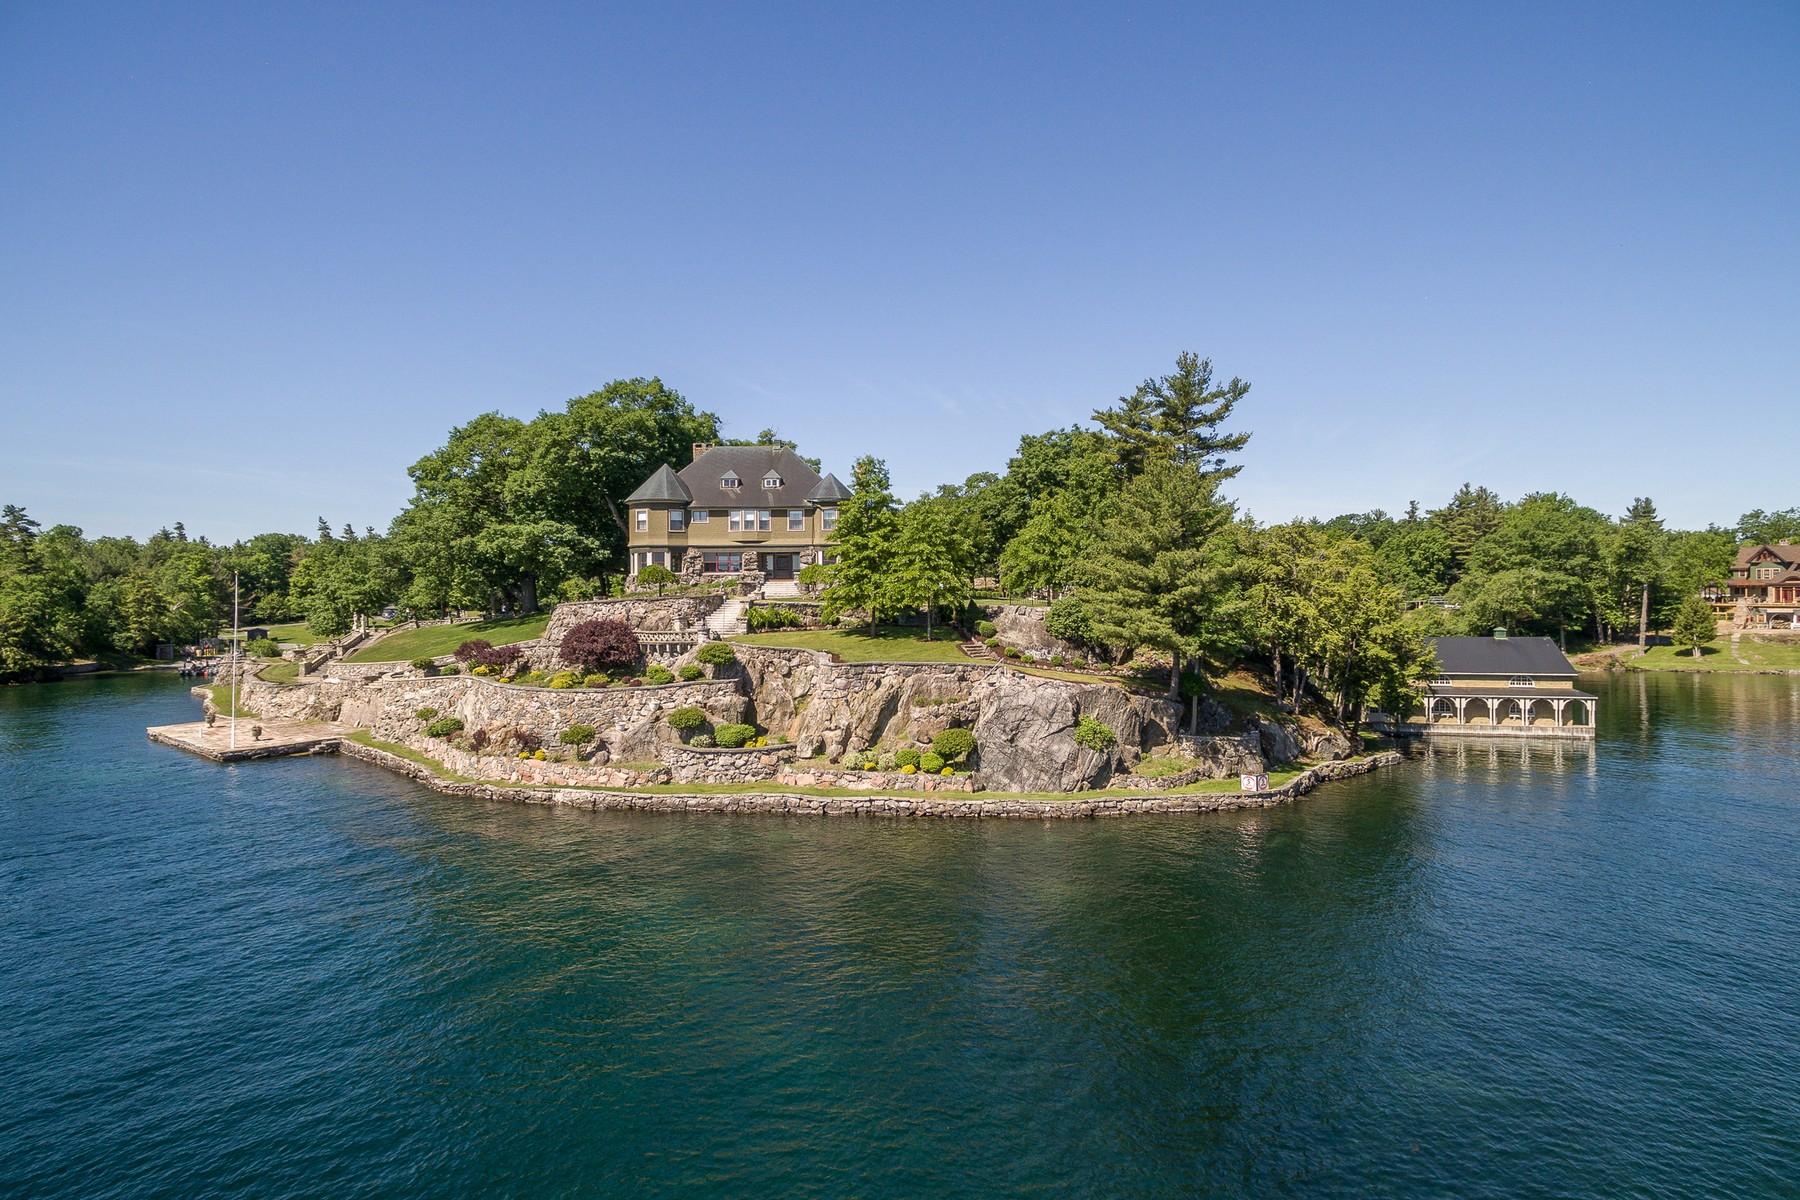 Additional photo for property listing at Hopewell Hall 45833  Landon Rd Alexandria Bay, Nueva York 13640 Estados Unidos